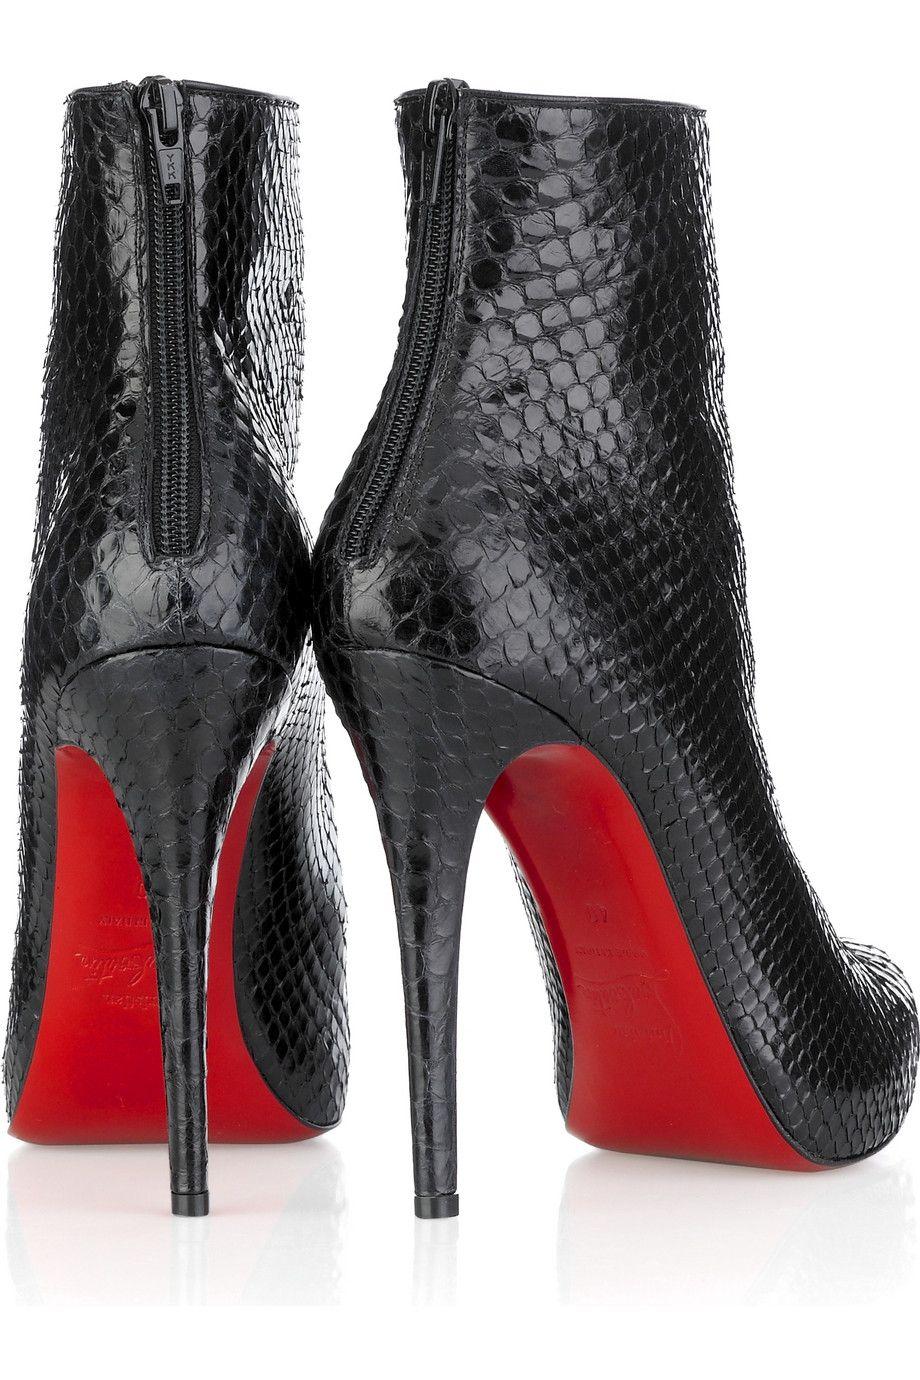 bottes femme louboutin